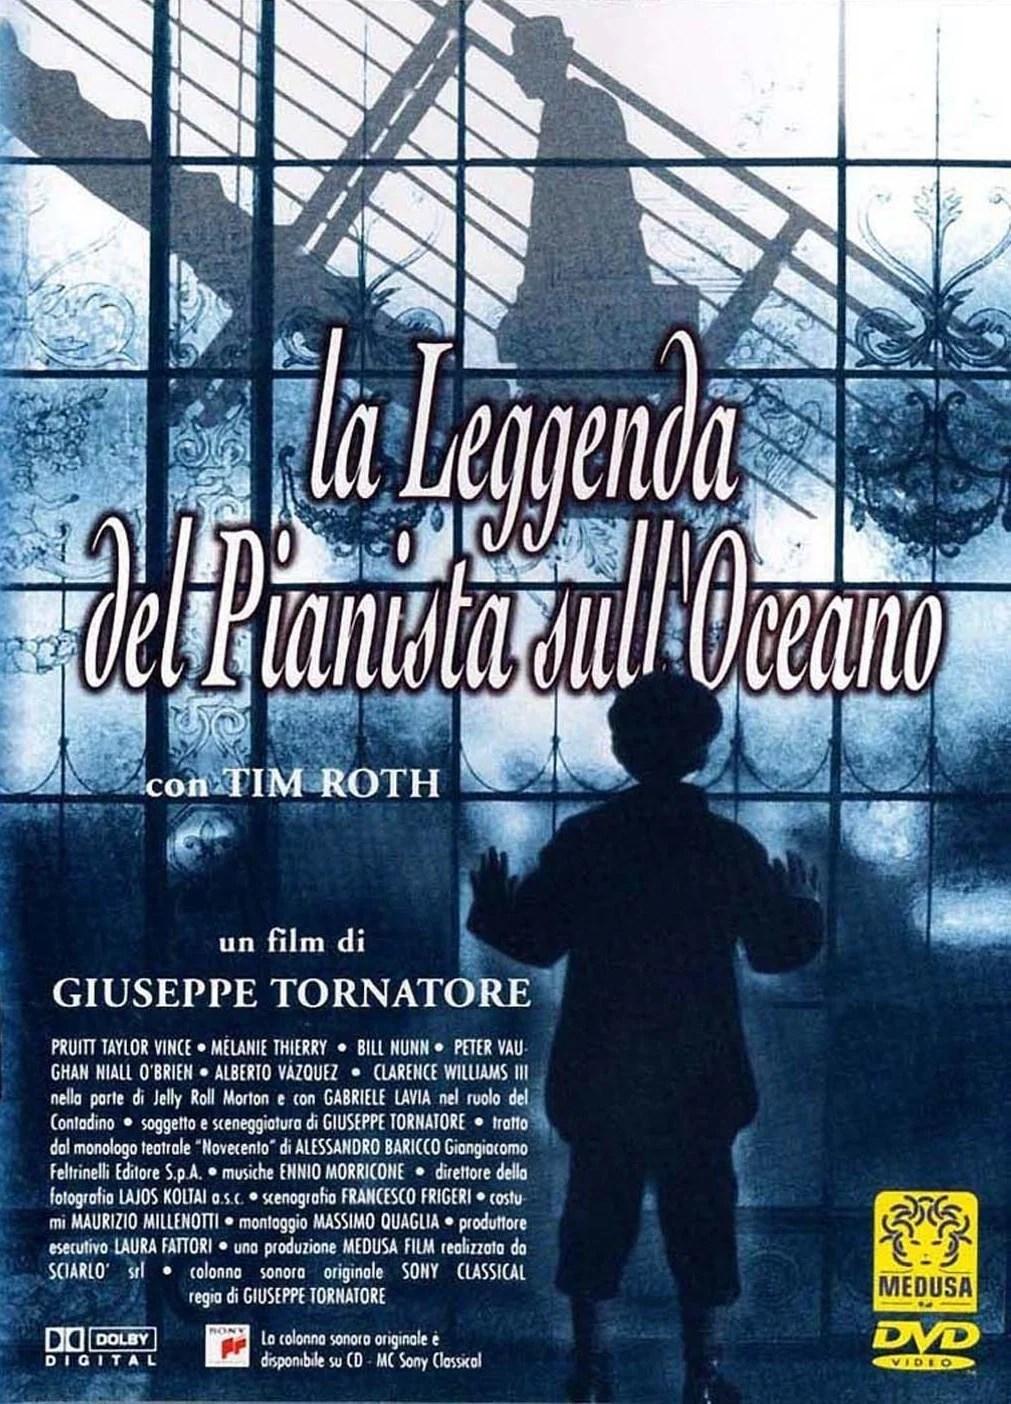 Giuseppe Tornatore - La Leggenda del Pianista sull'Oceano